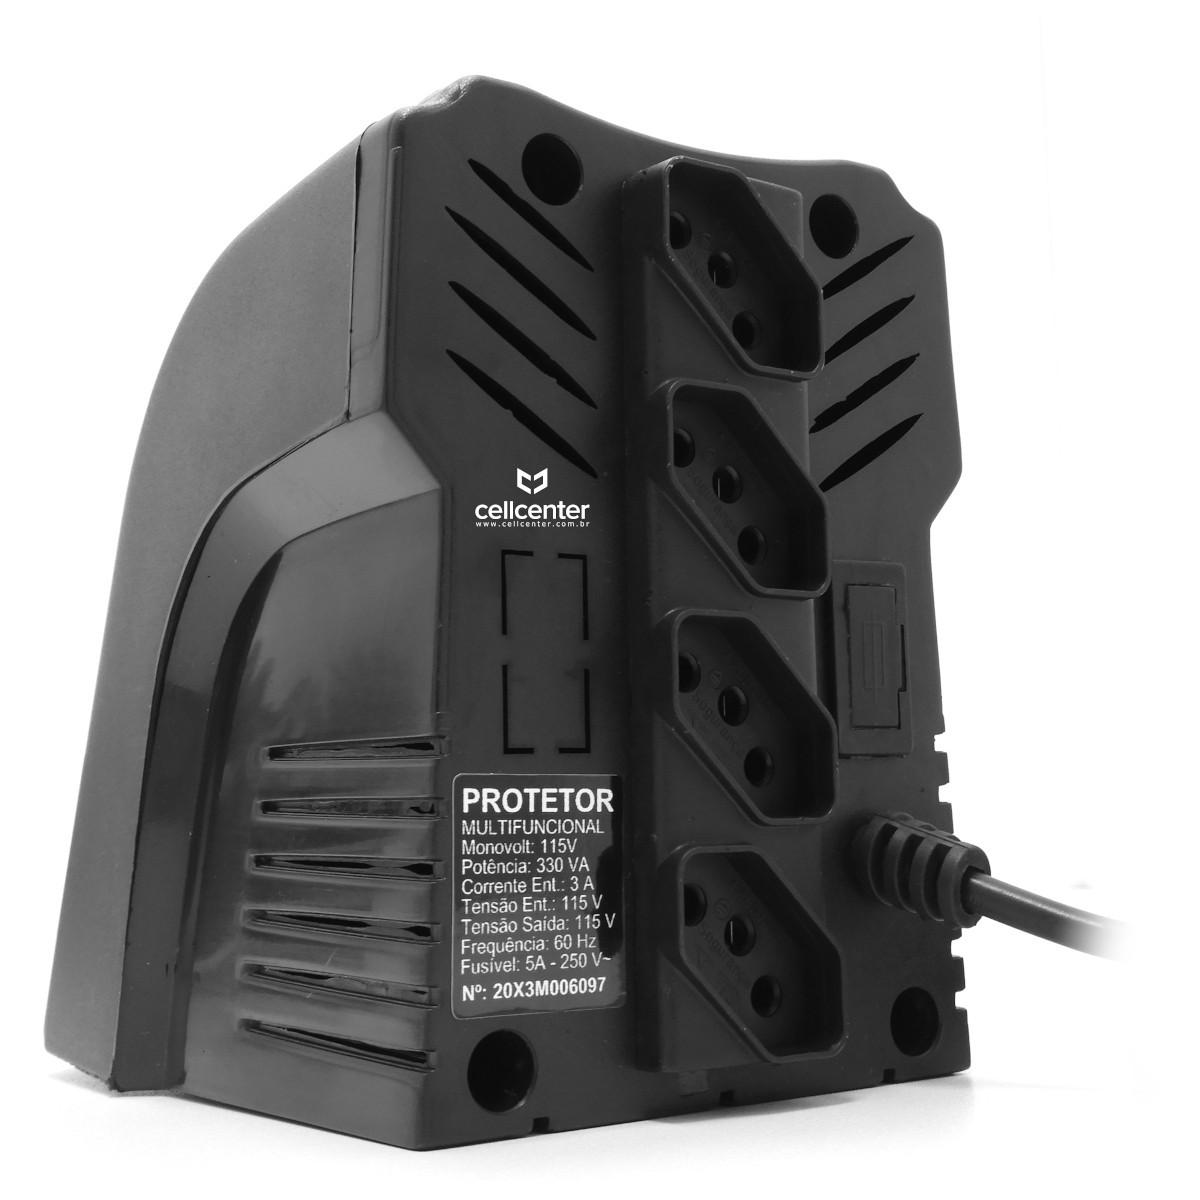 Protetor de Corrente elétrica Multifuncional 4 Tomadas Involts